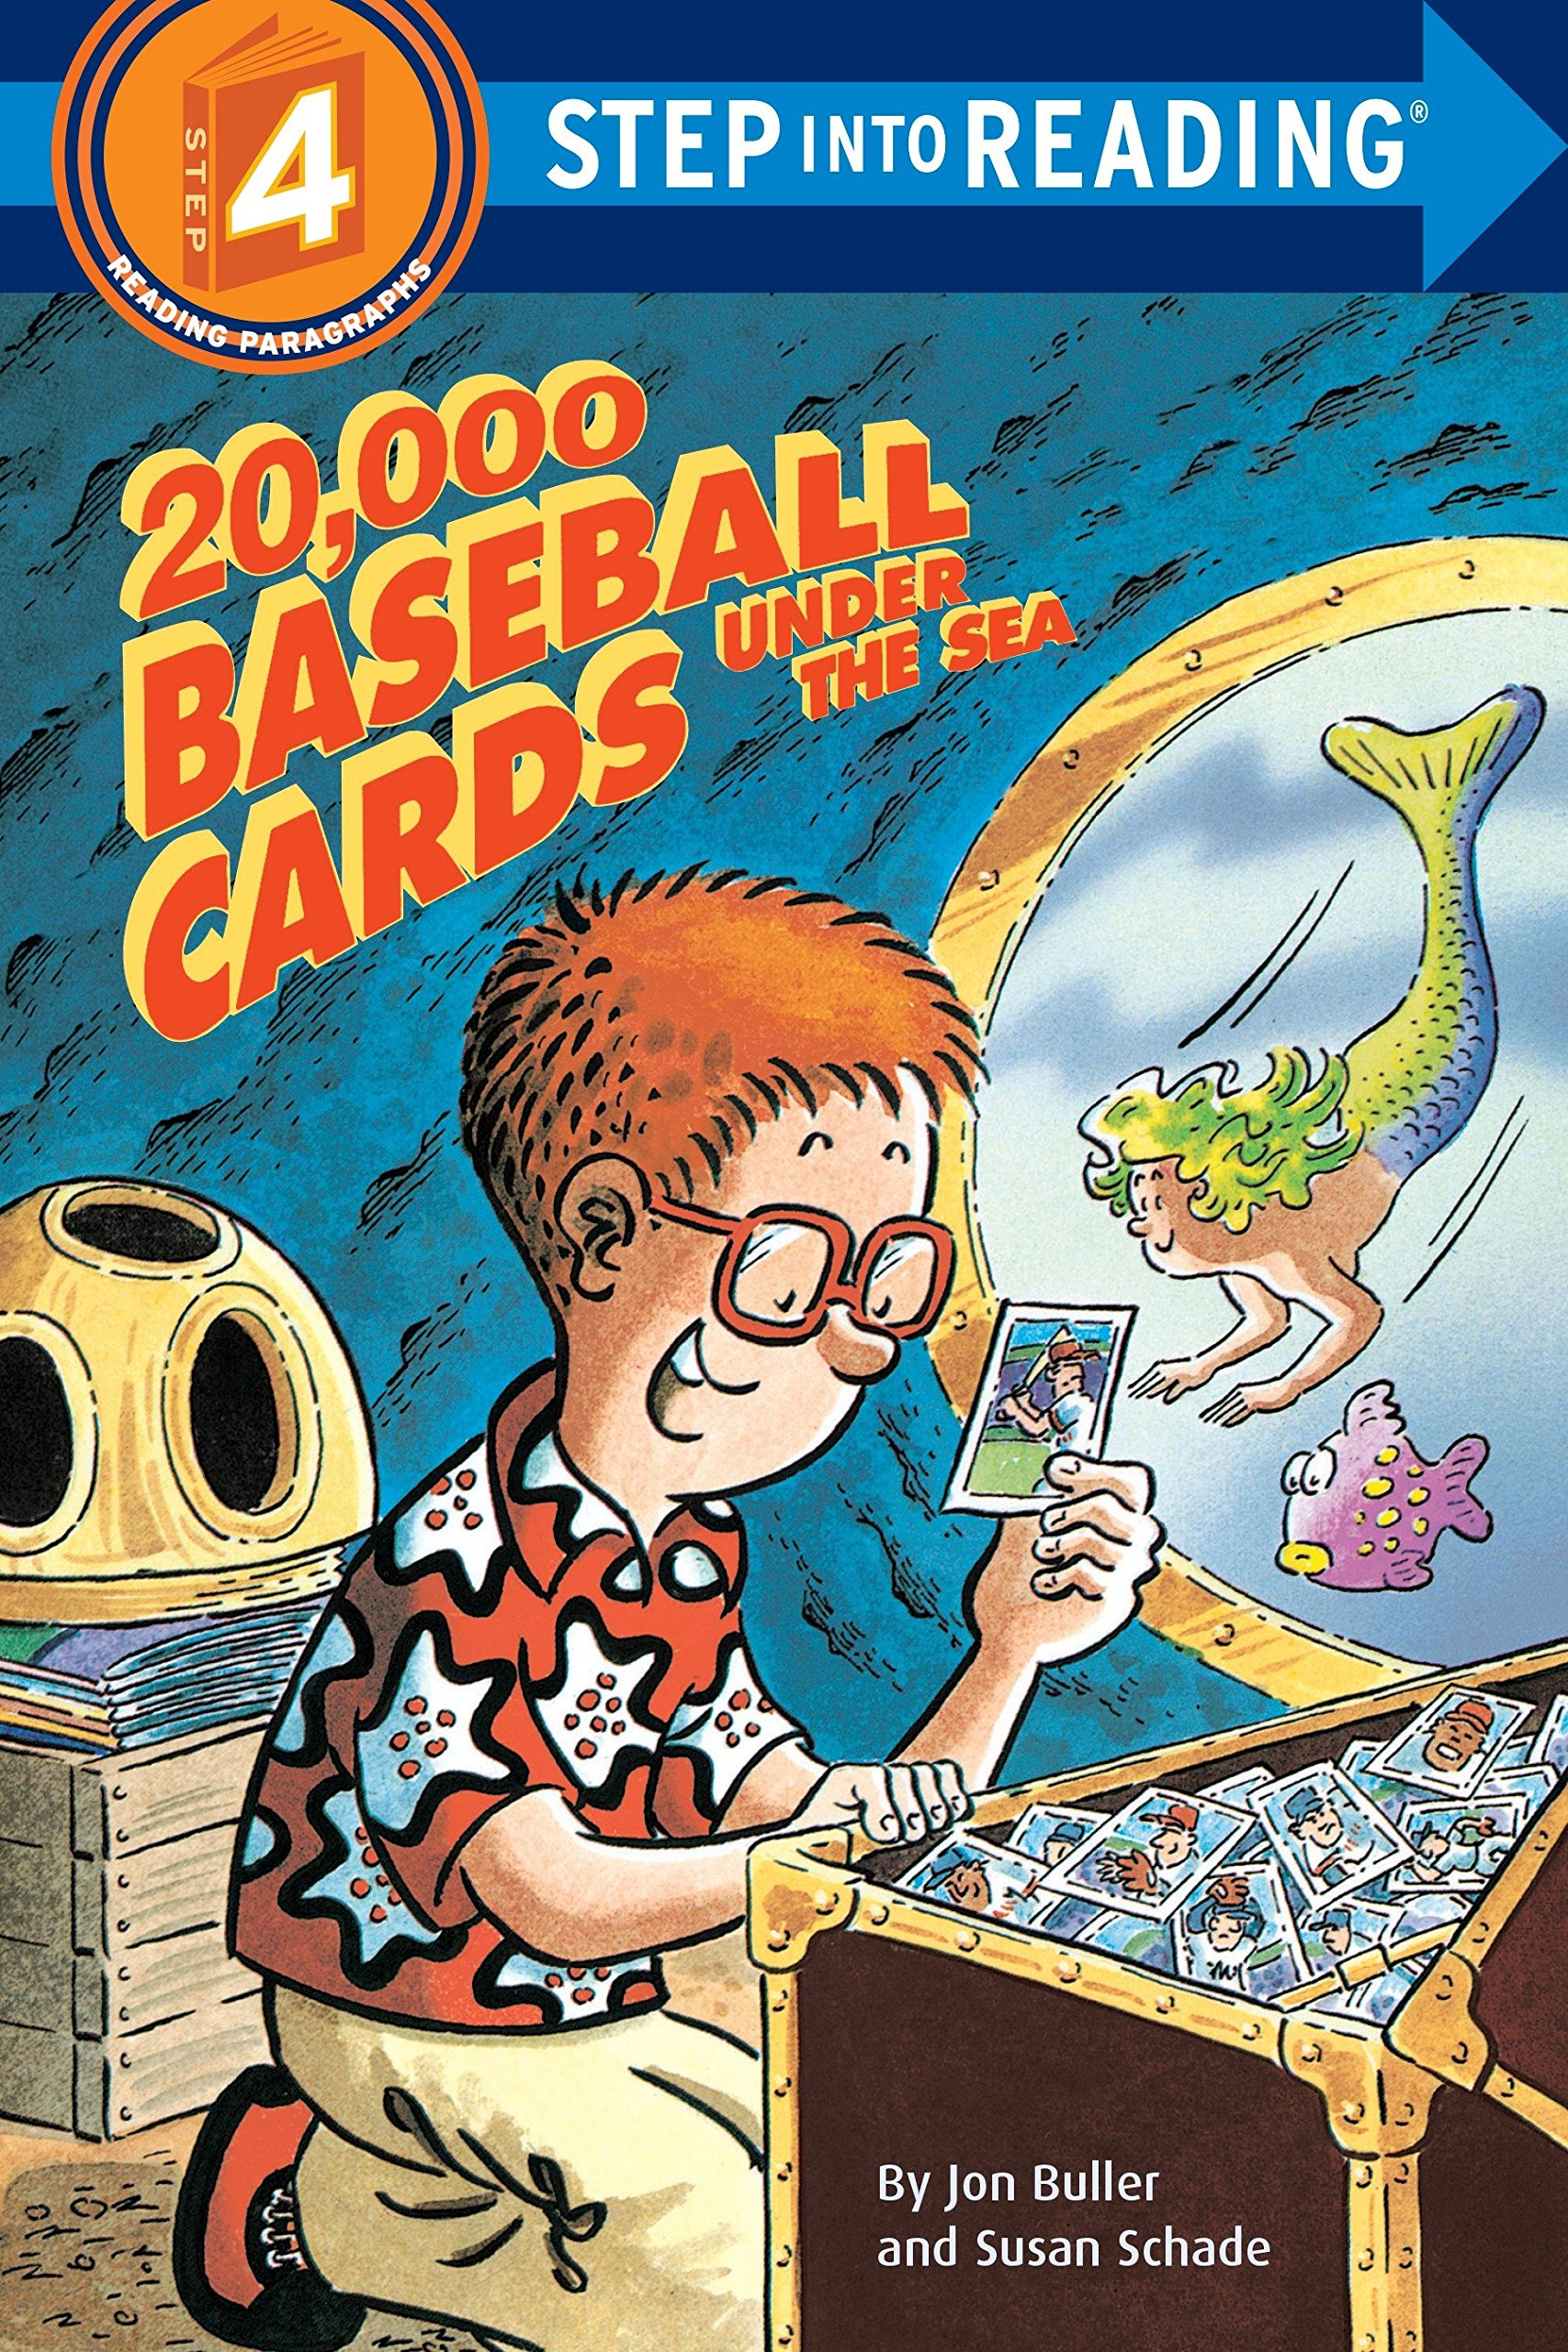 Amazon.com: 20,000 Baseball Cards Under the Sea (Step-Into-Reading, Step 4)  (9780679815693): Jon Buller: Books